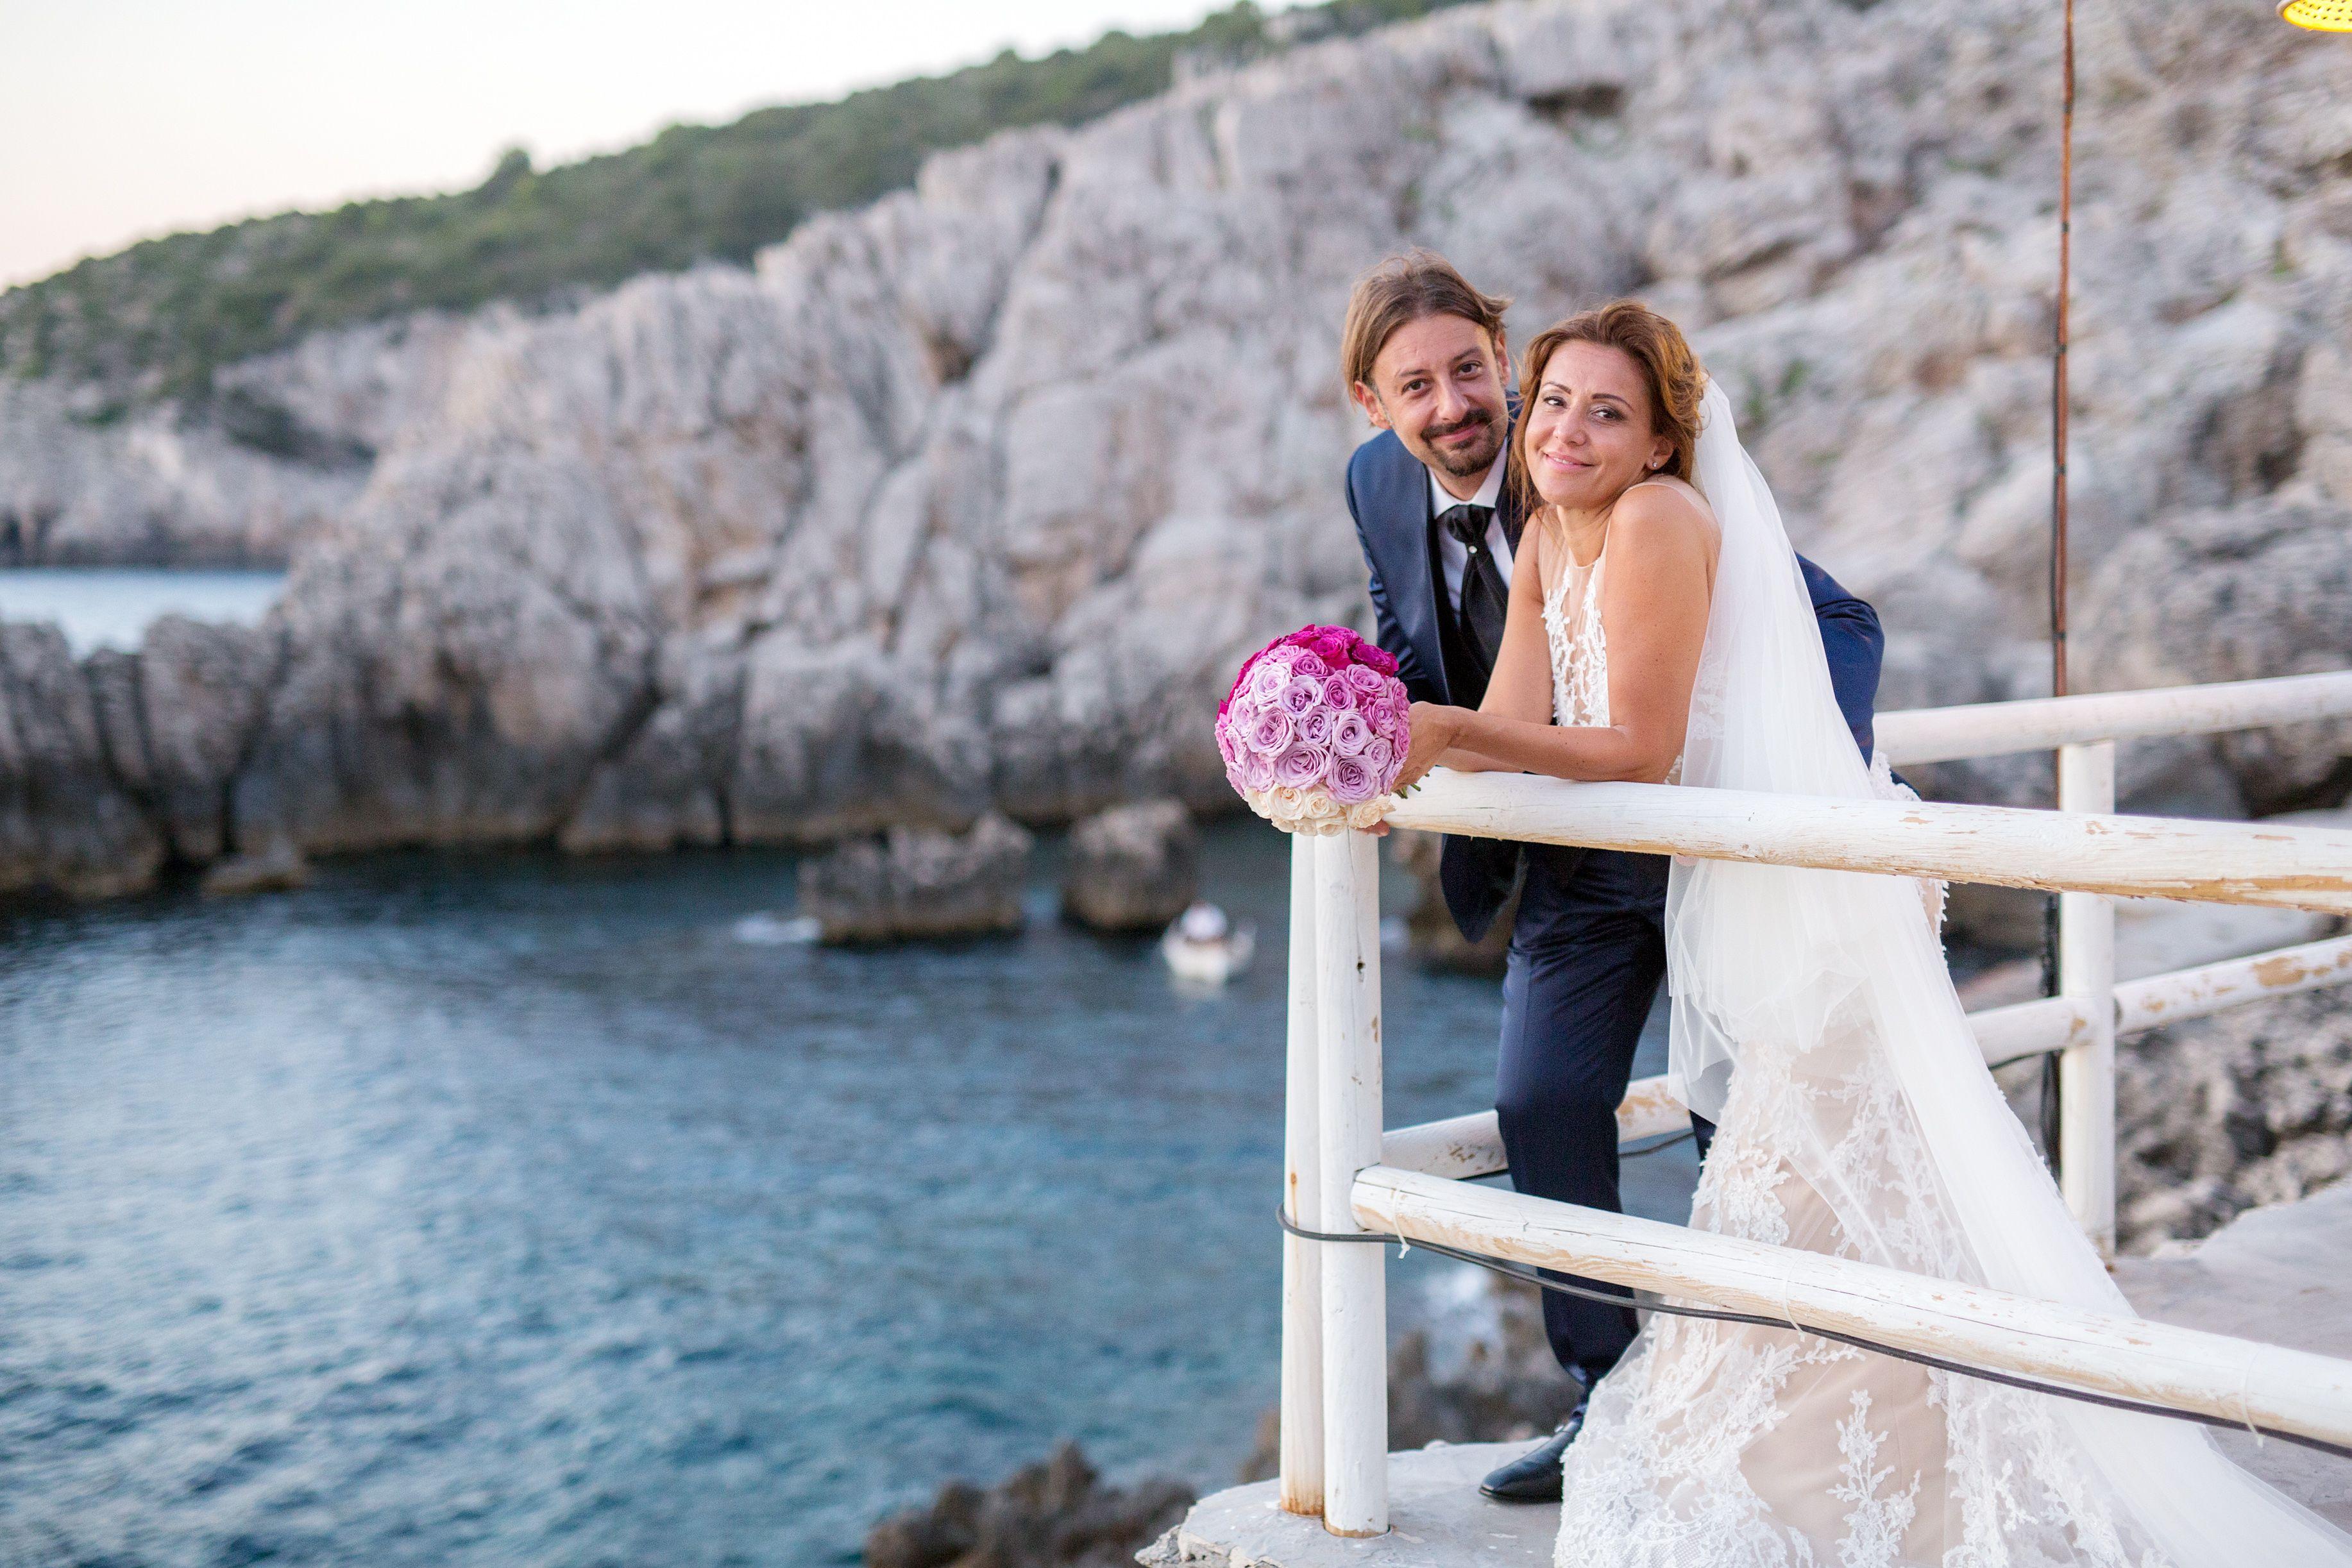 Anna & Angelo  #capriwedding #amalficoastwedding #islandofcapri #caprimoments #love